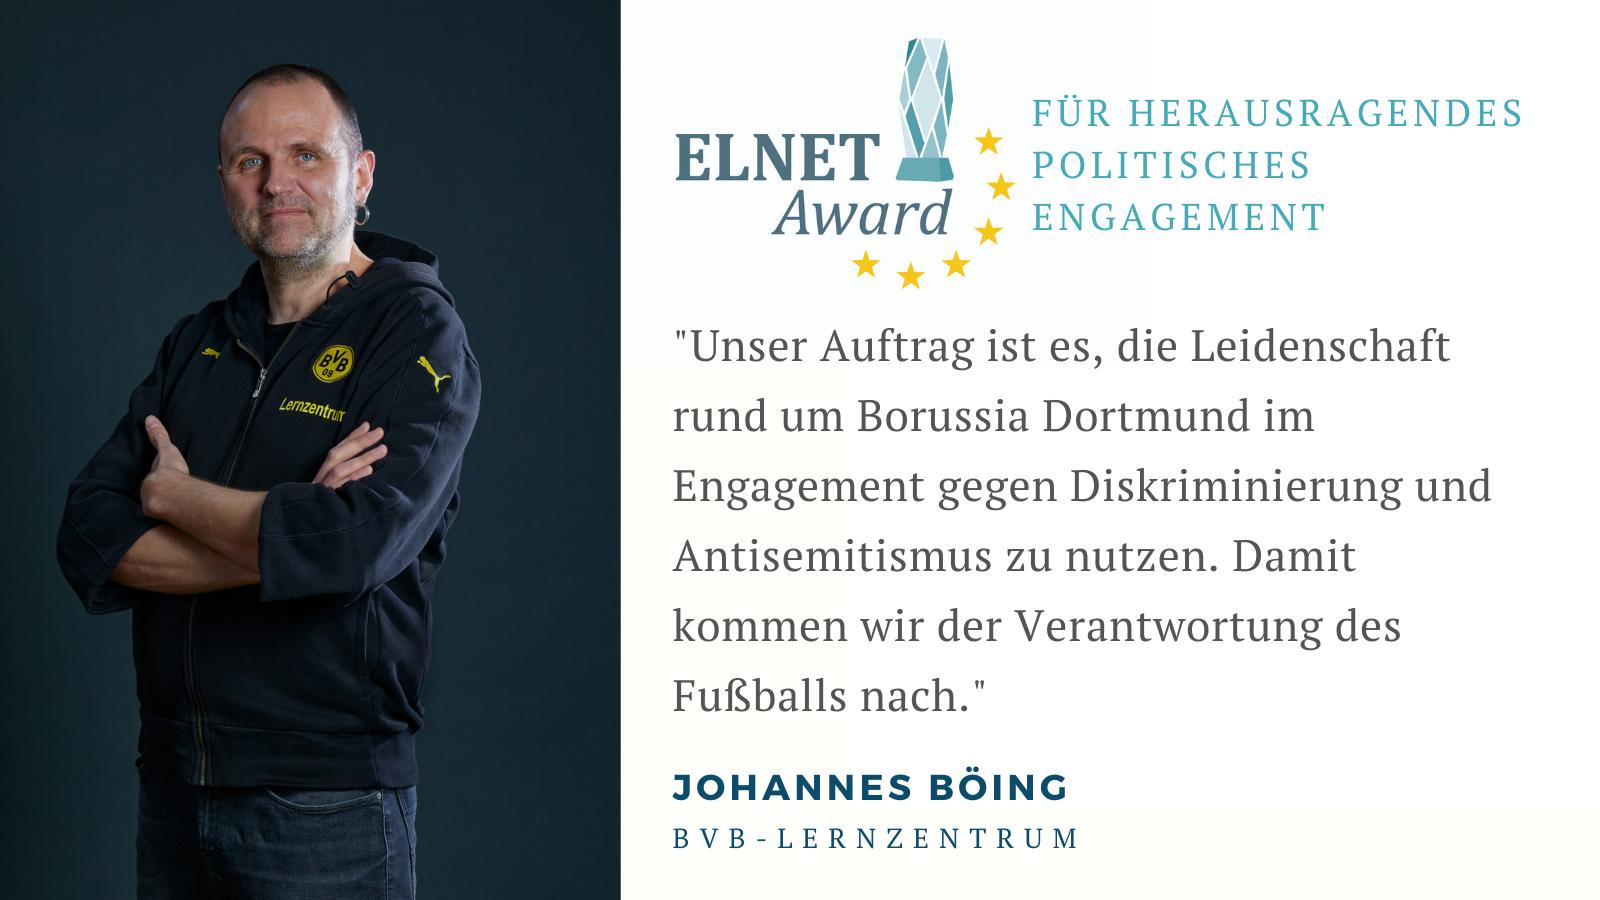 Johannes Böing erhält ELNET AWARD